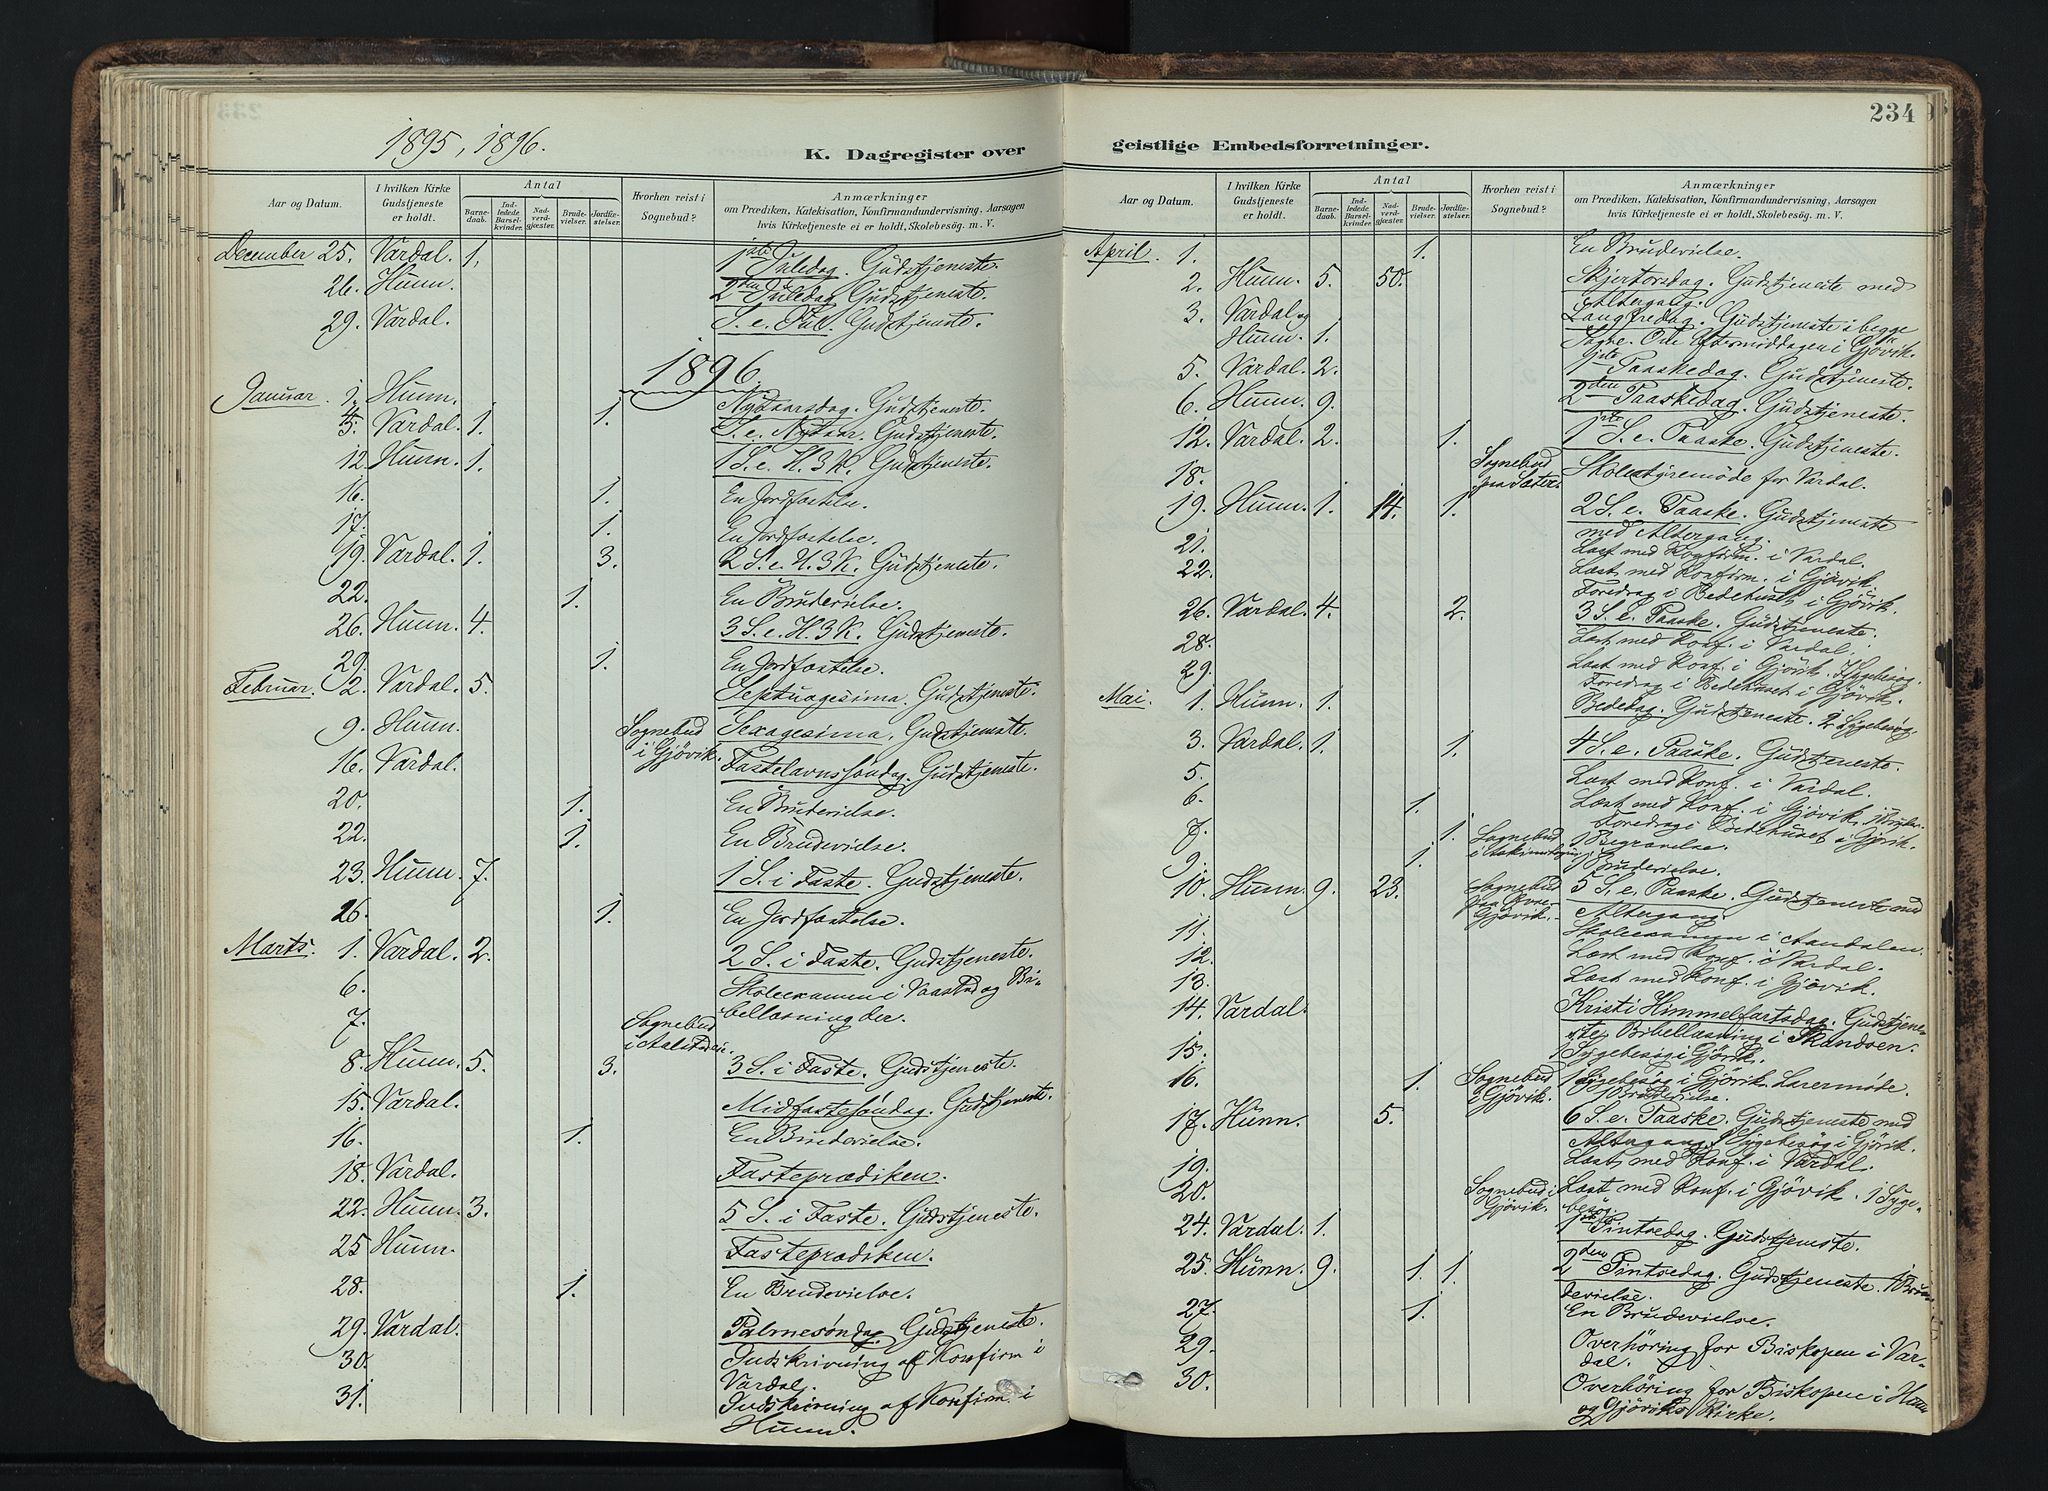 SAH, Vardal prestekontor, H/Ha/Haa/L0019: Ministerialbok nr. 19, 1893-1907, s. 234